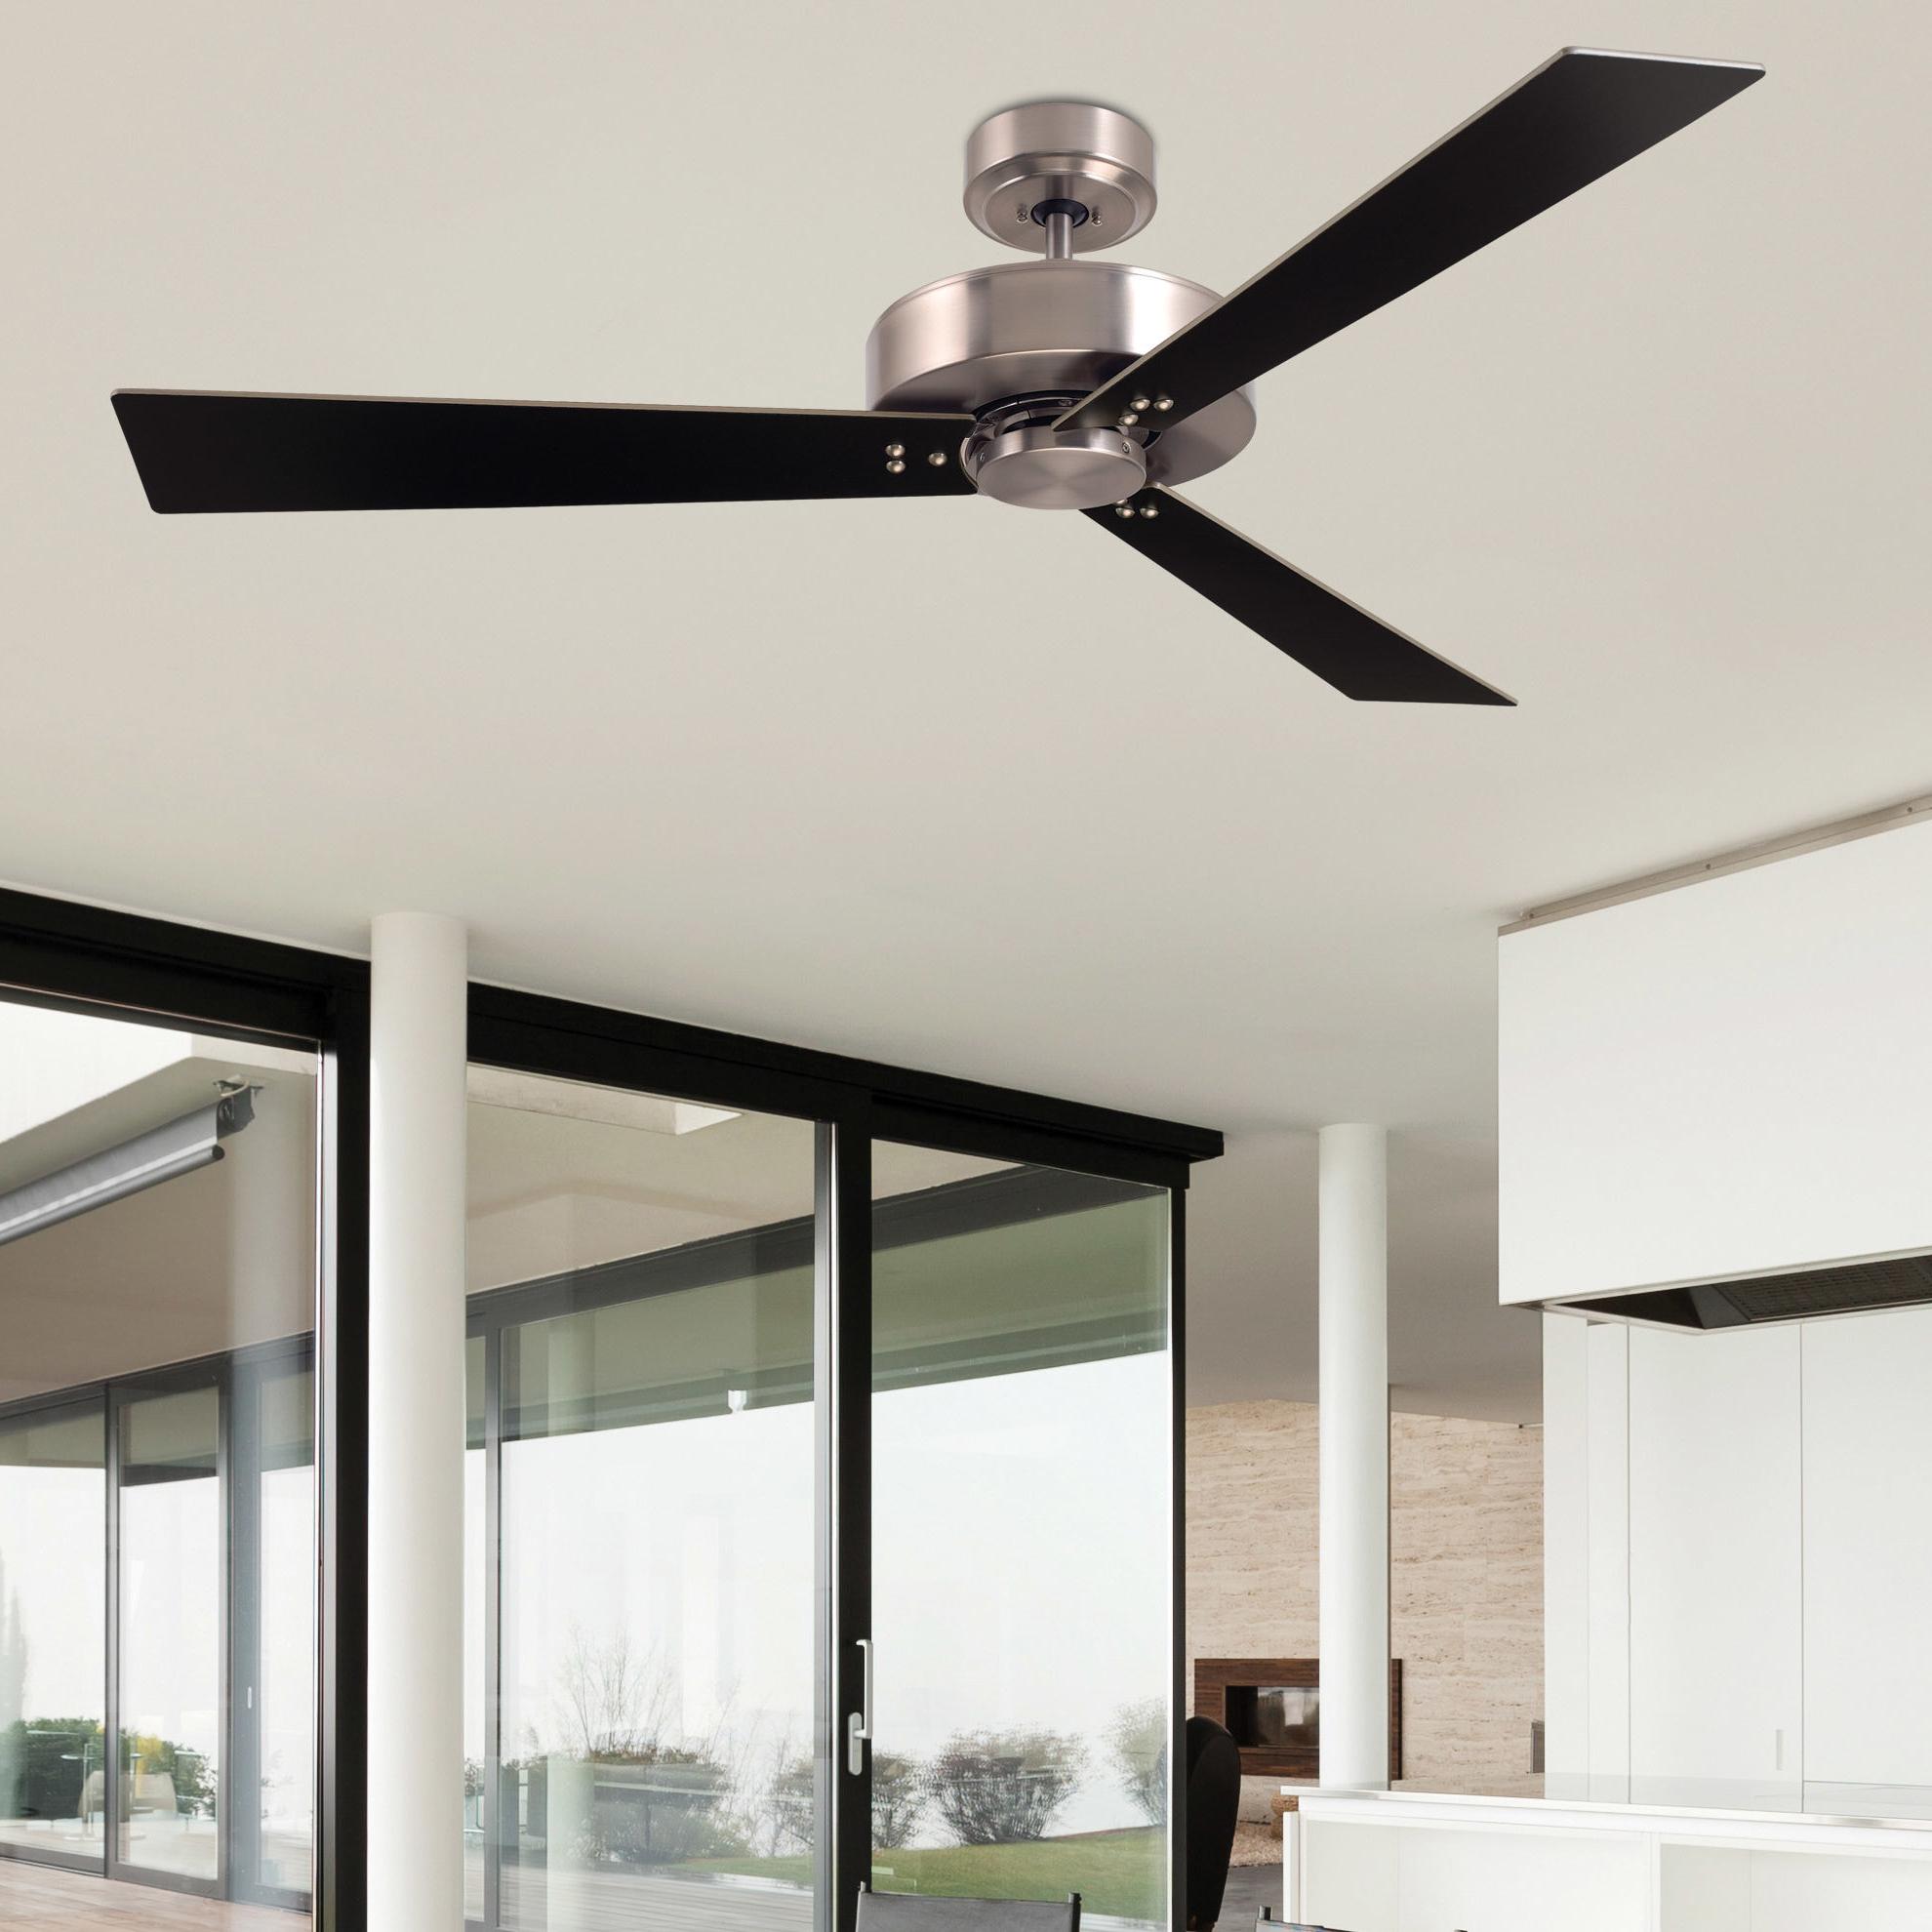 "Smoak 3 Blade Ceiling Fans Throughout Recent 52"" Troxler 3 Blade Ceiling Fan (View 19 of 20)"